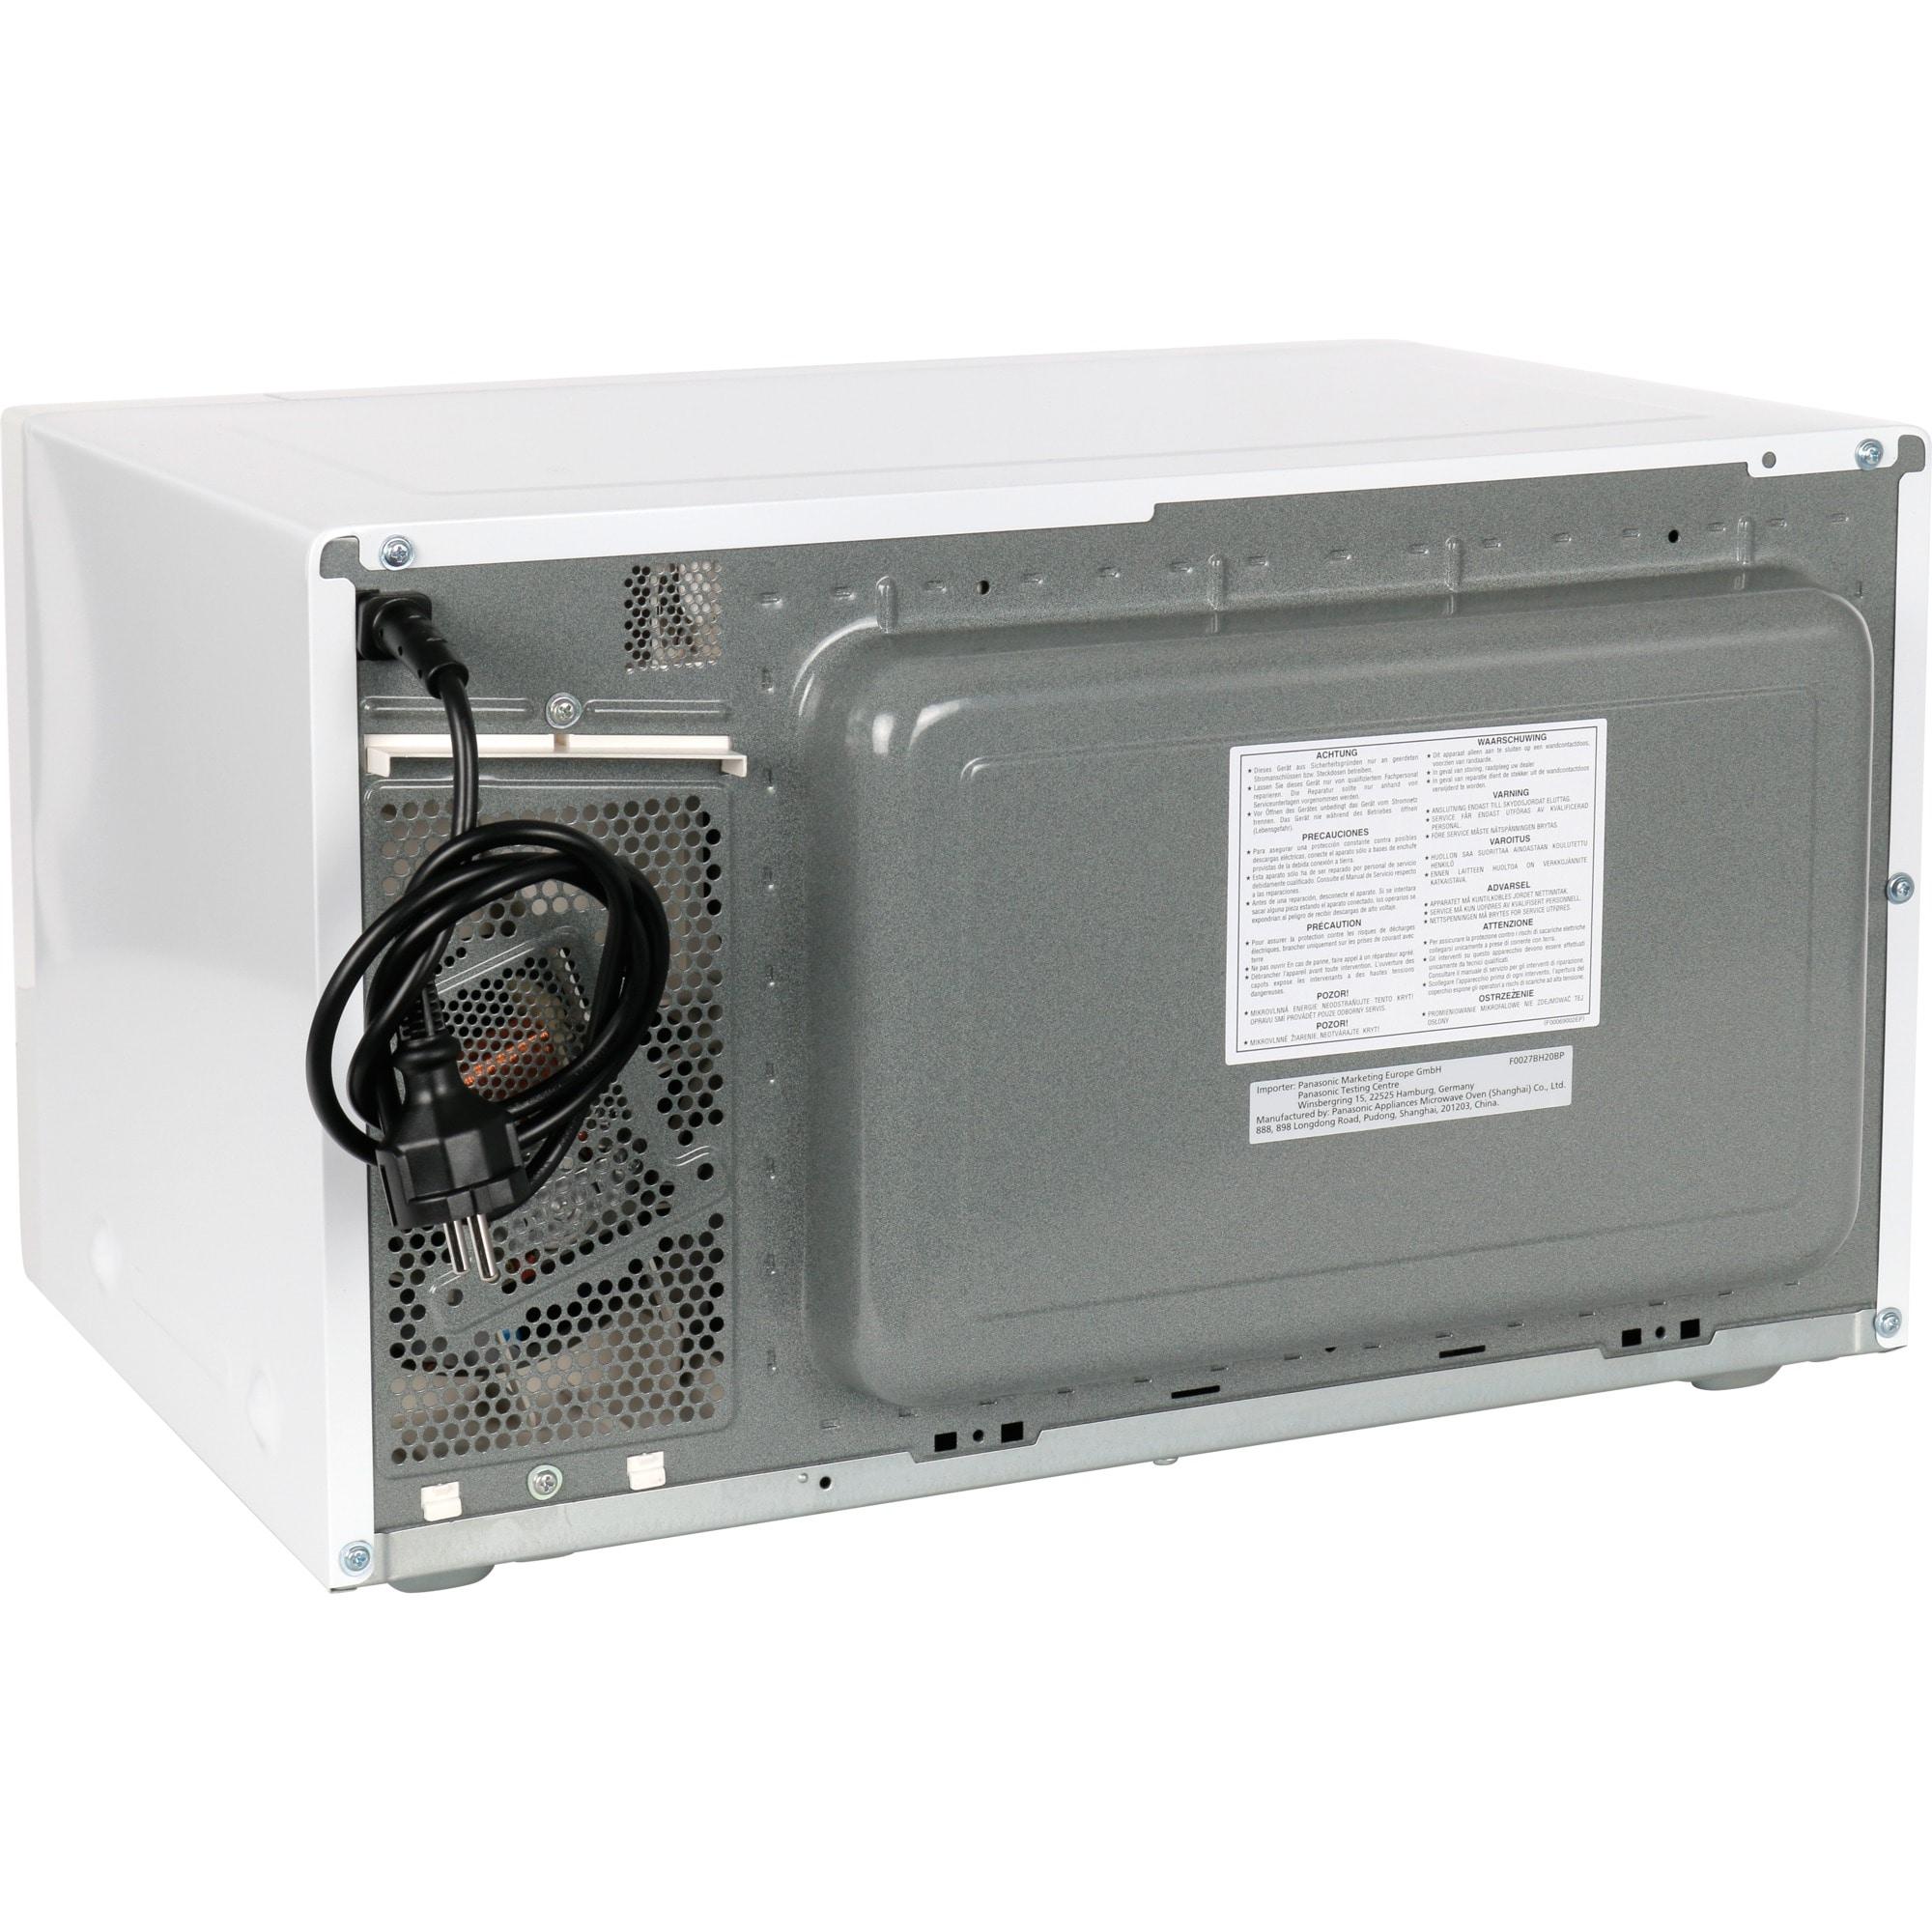 Panasonic Mikrowelle NN-SD452W